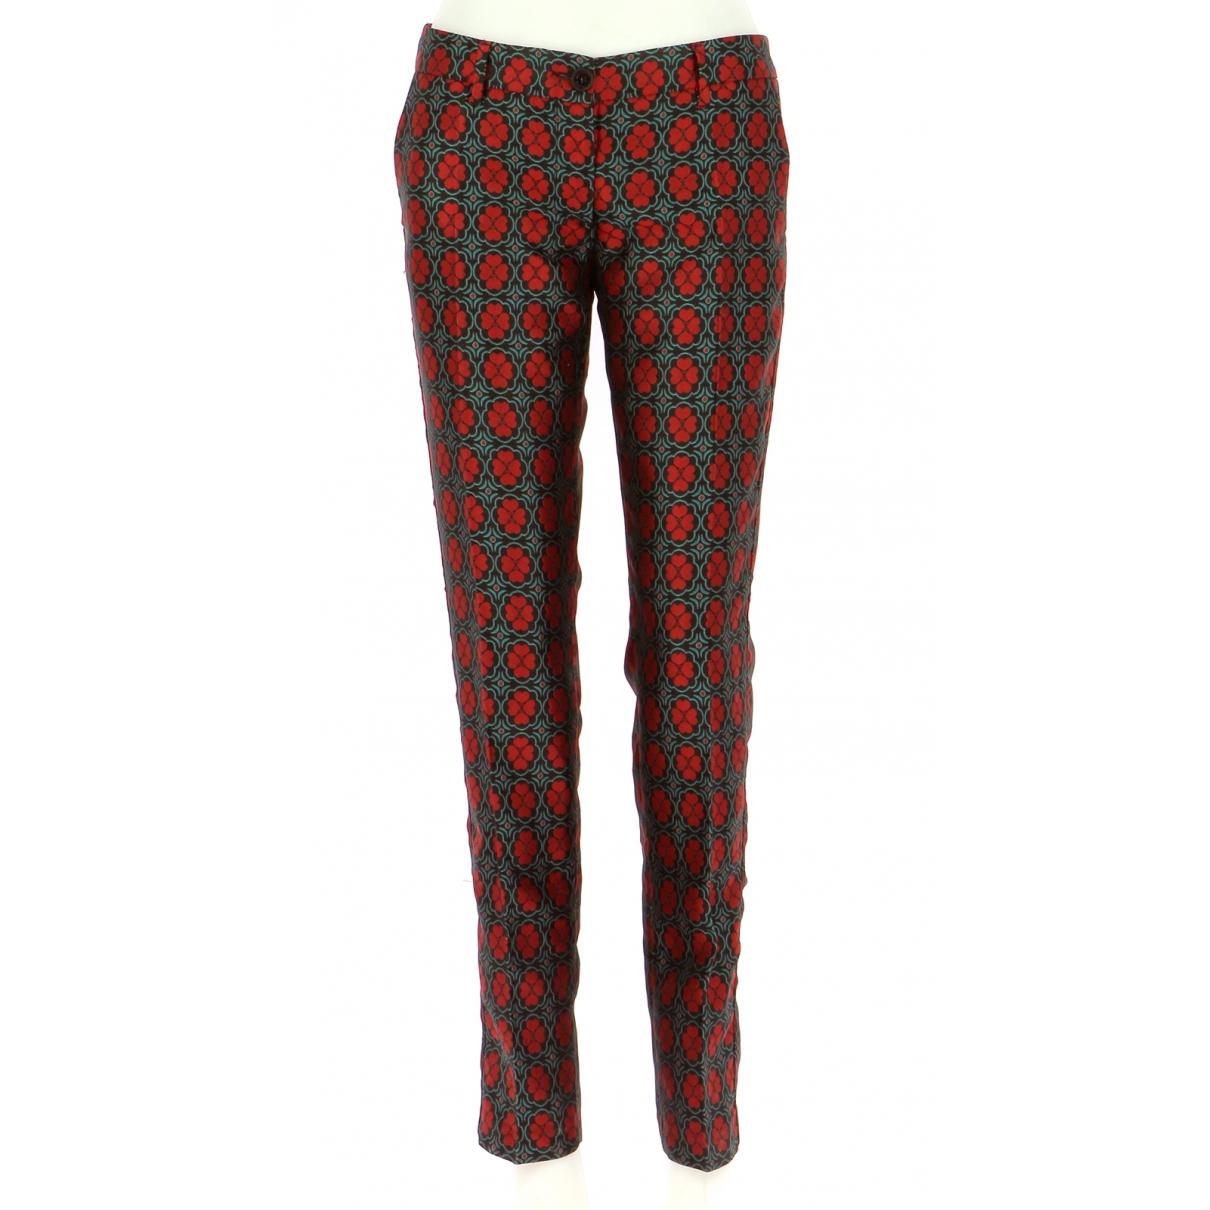 Pantalones en Poliester Rojo Moschino Love